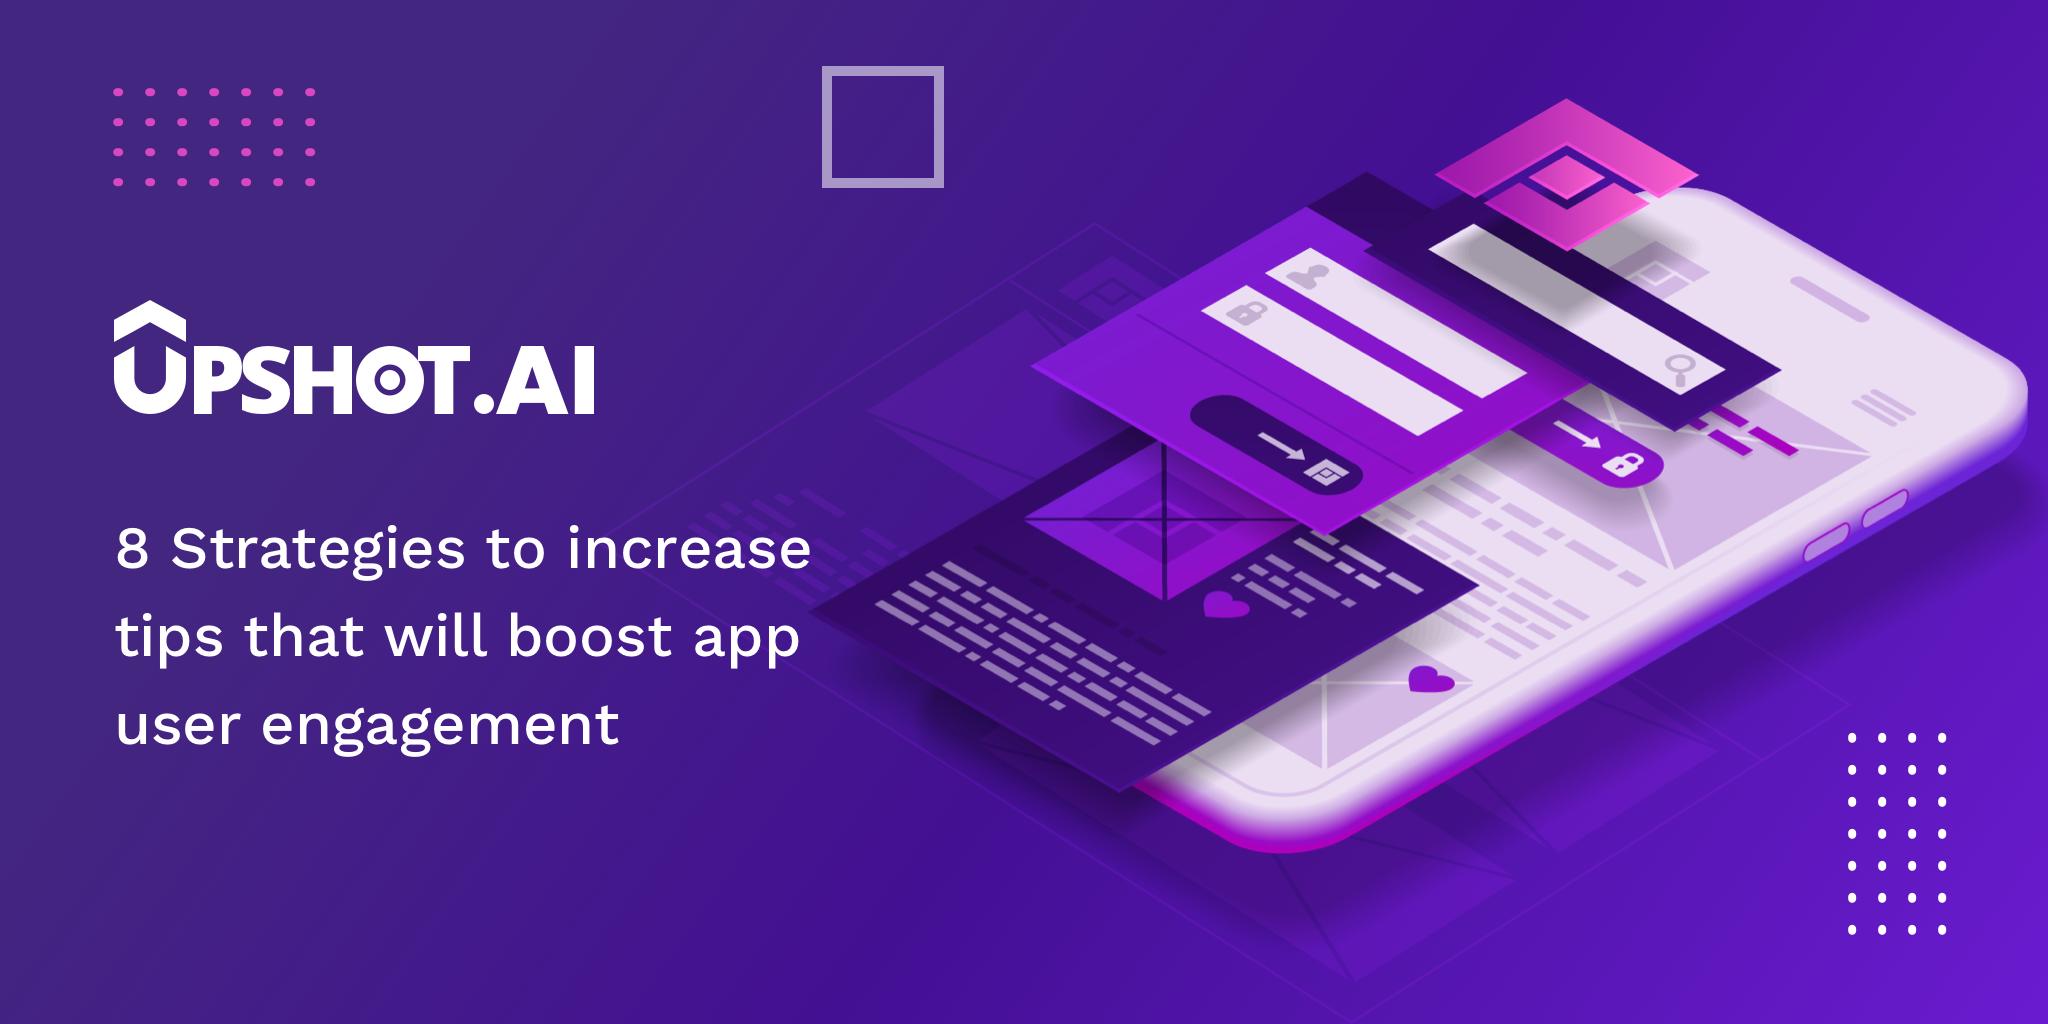 Boost app user engagement